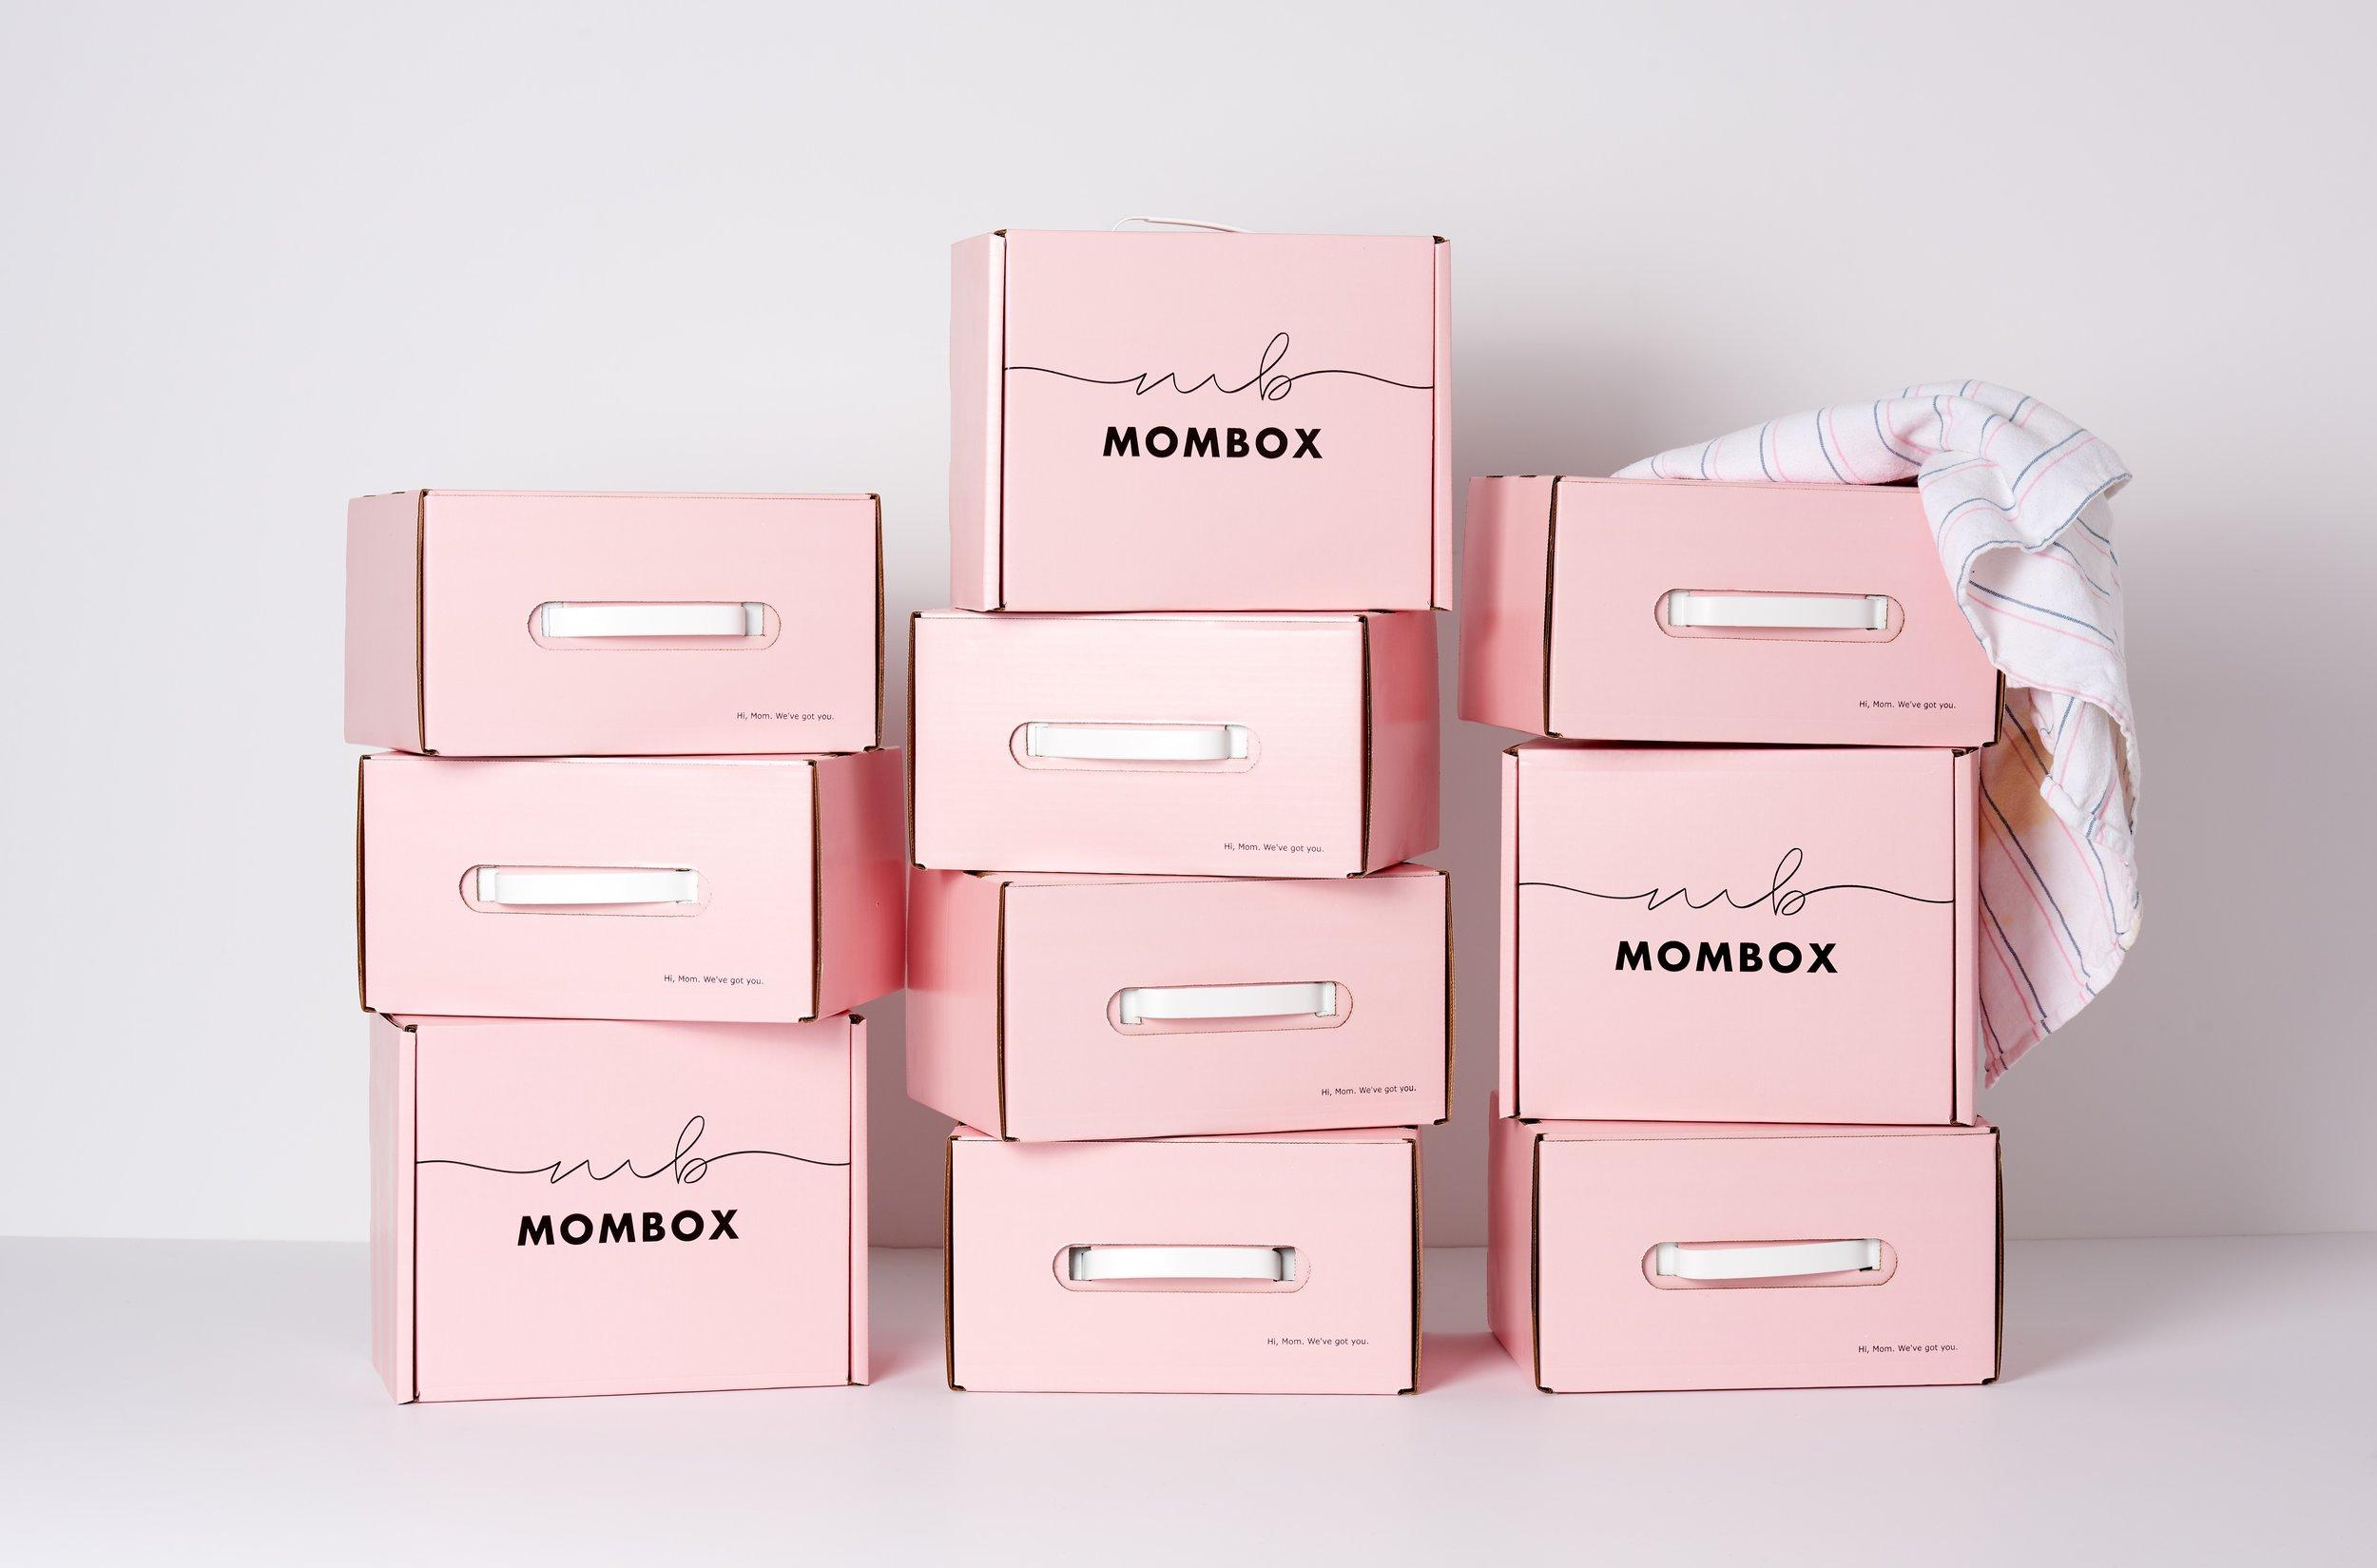 MomBox_Box_Tower_07 copy 2.jpg